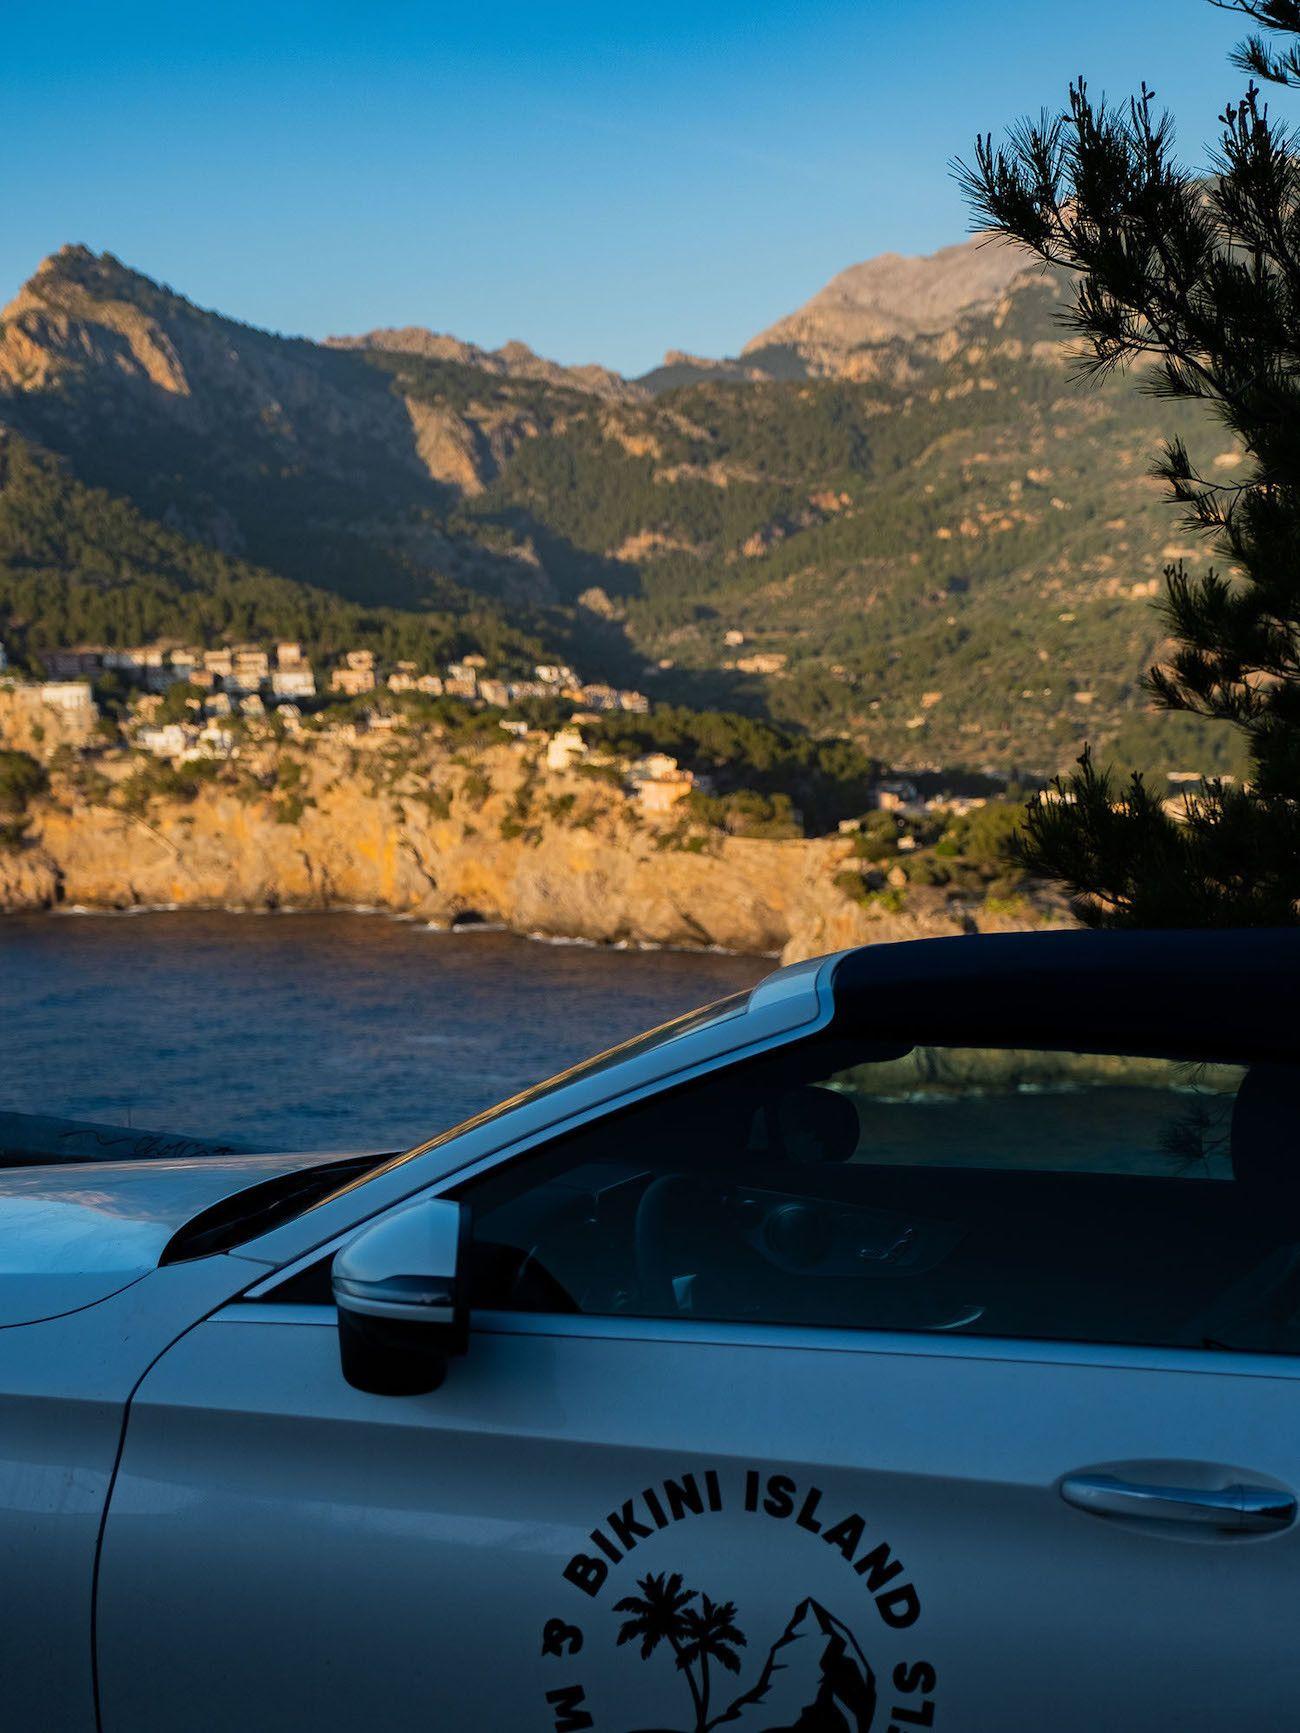 Foodblog About Fuel, Bikini Island & Mountain Hotels, Mercedes Benz, Port de Sóller